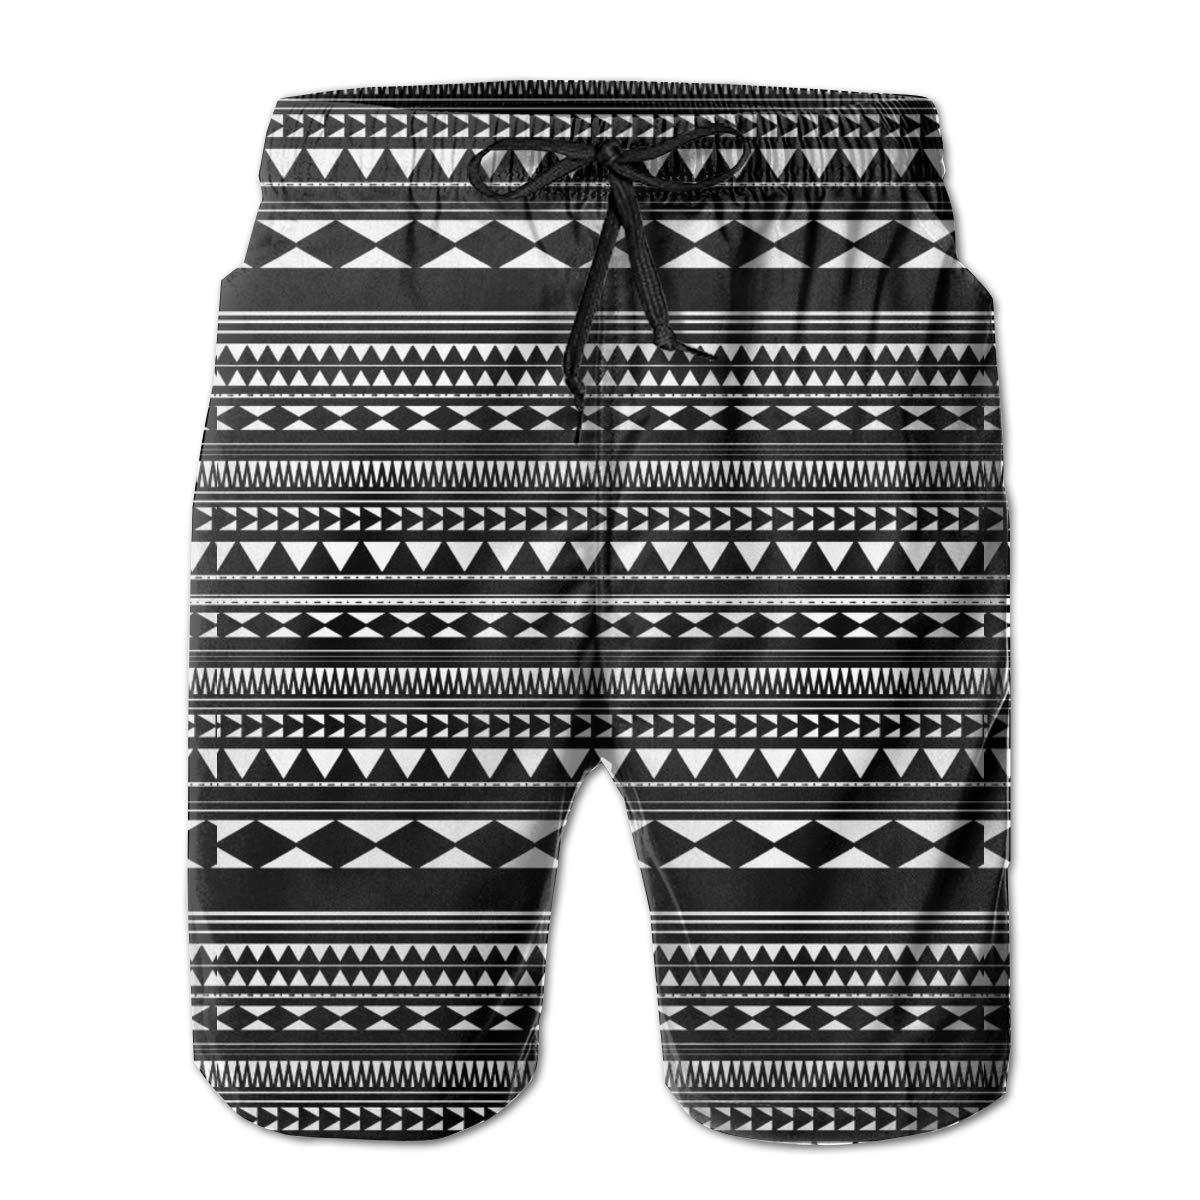 WMDJEG Geometric Retro Pattern Mens Summer Beachwear Sports Running Swim Board Shorts Mesh Lining